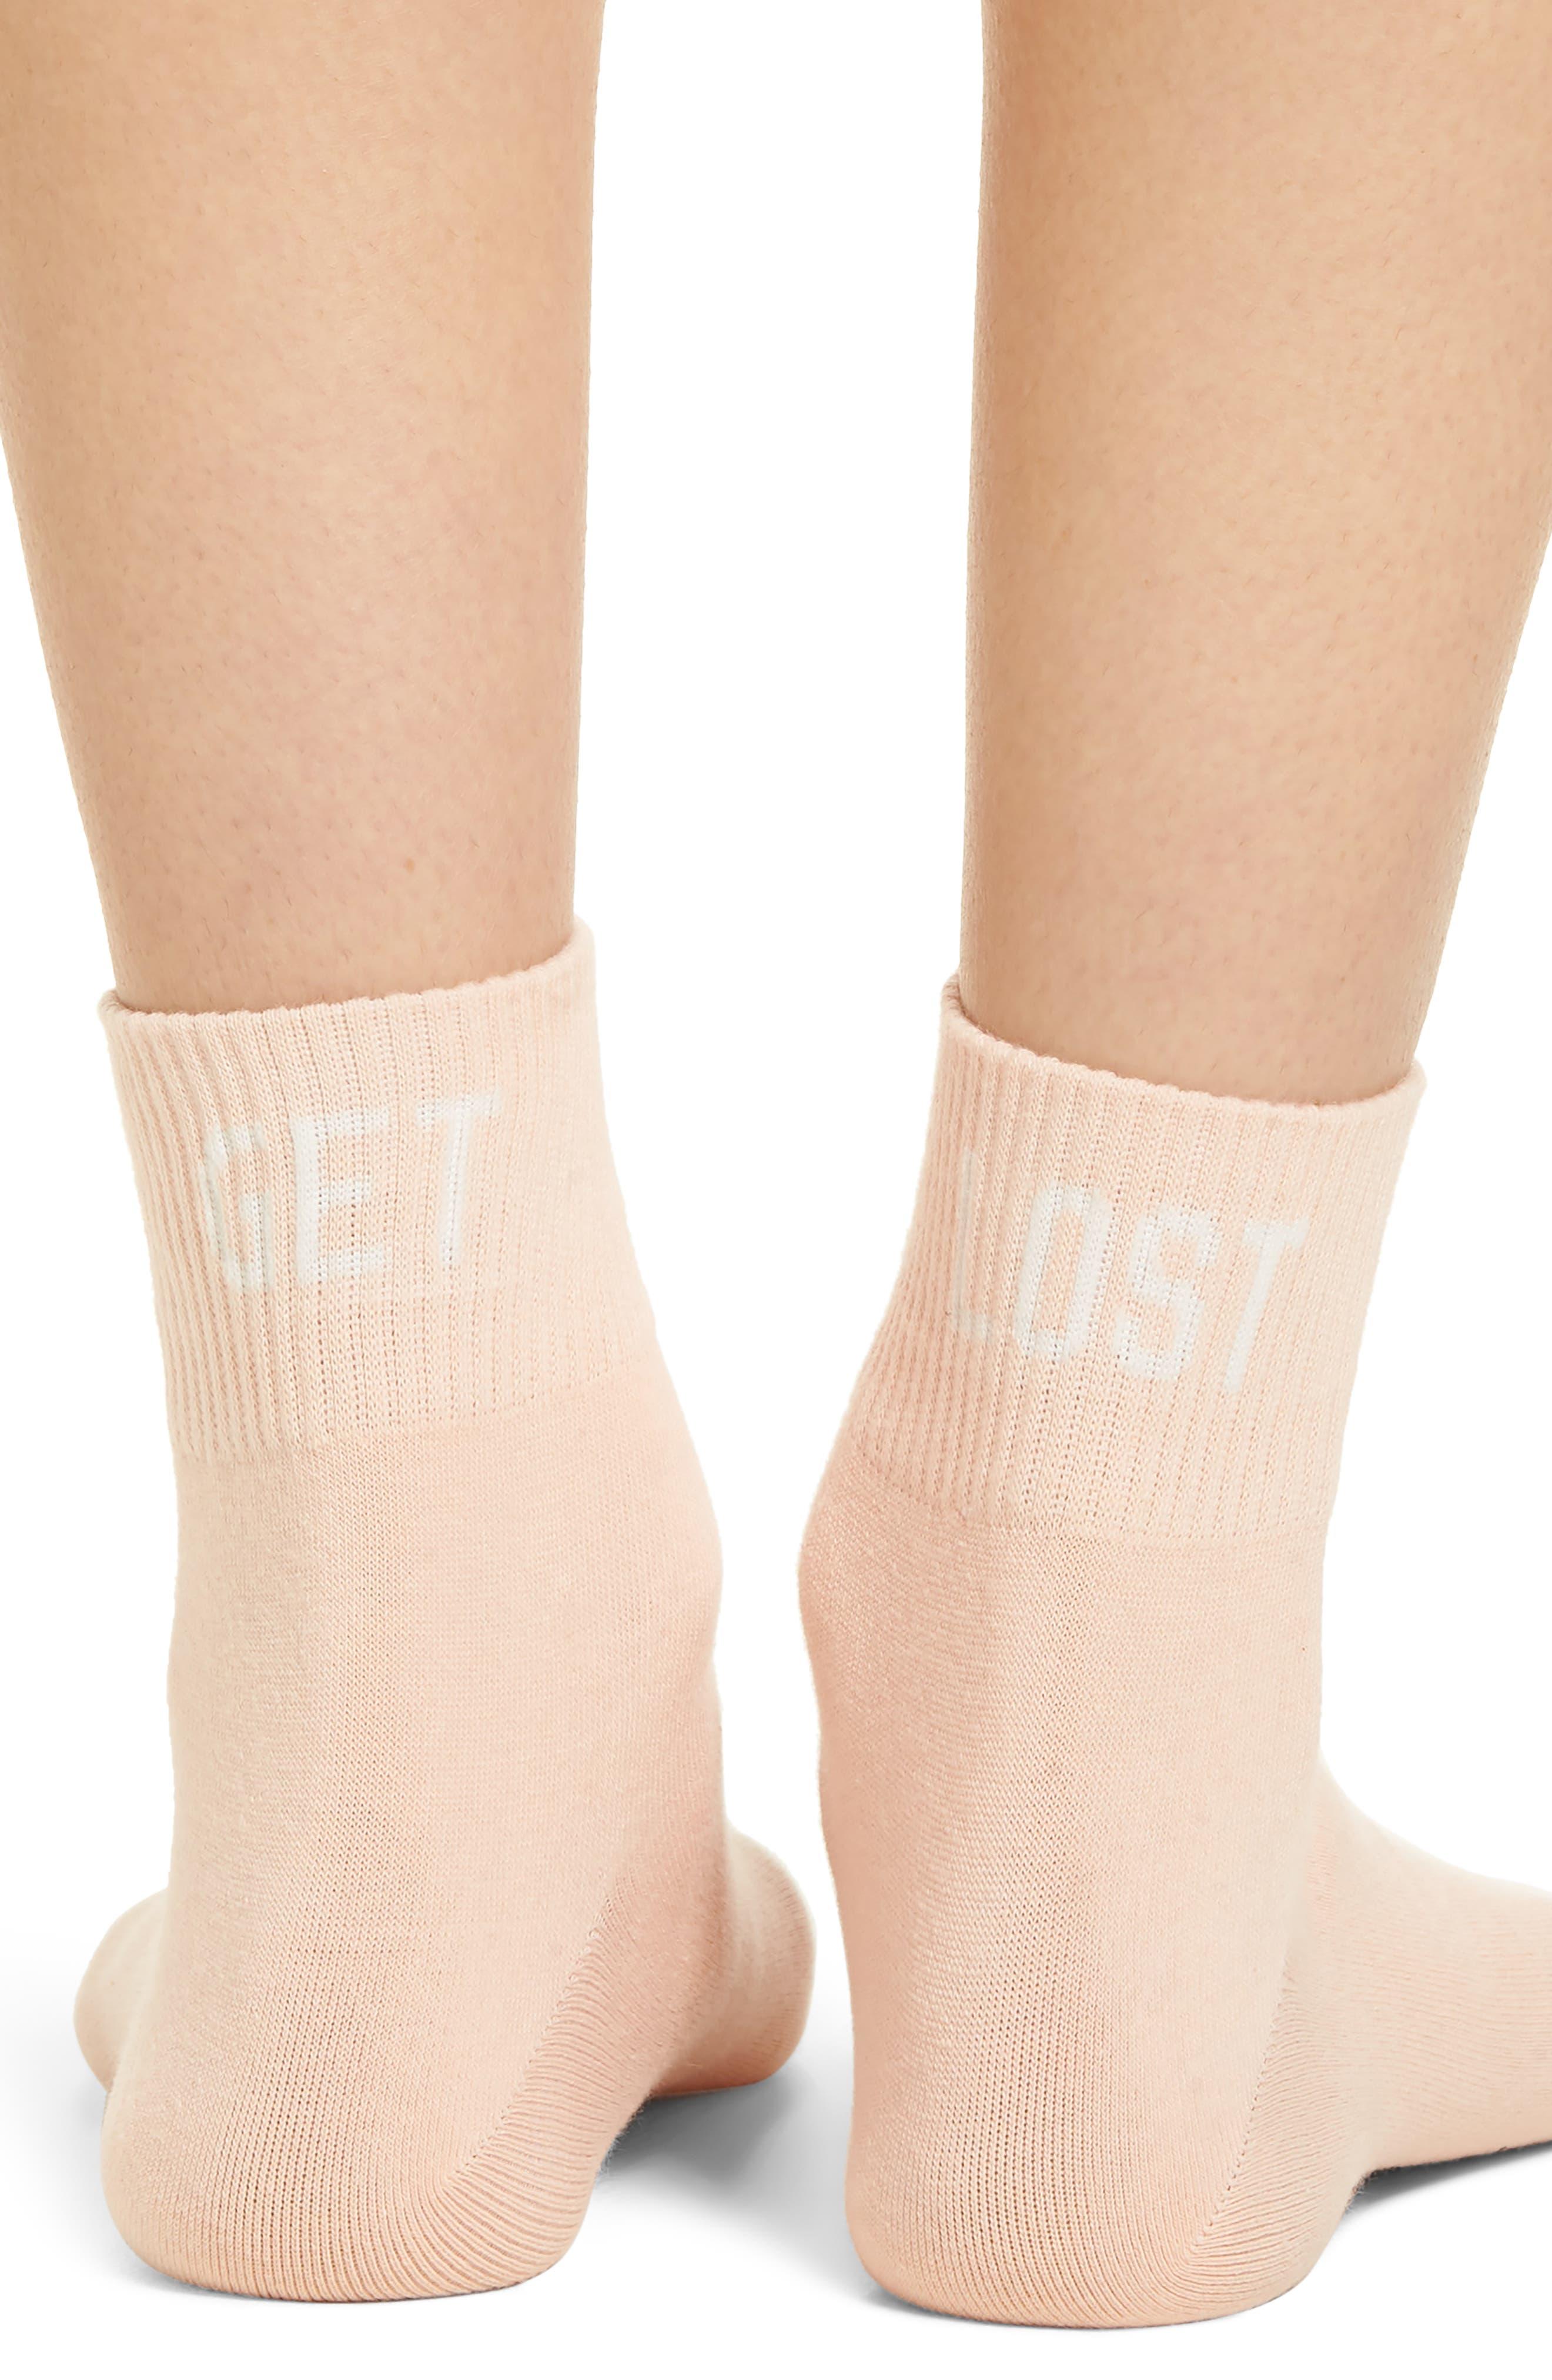 Get Lost Ankle Socks,                             Alternate thumbnail 3, color,                             630